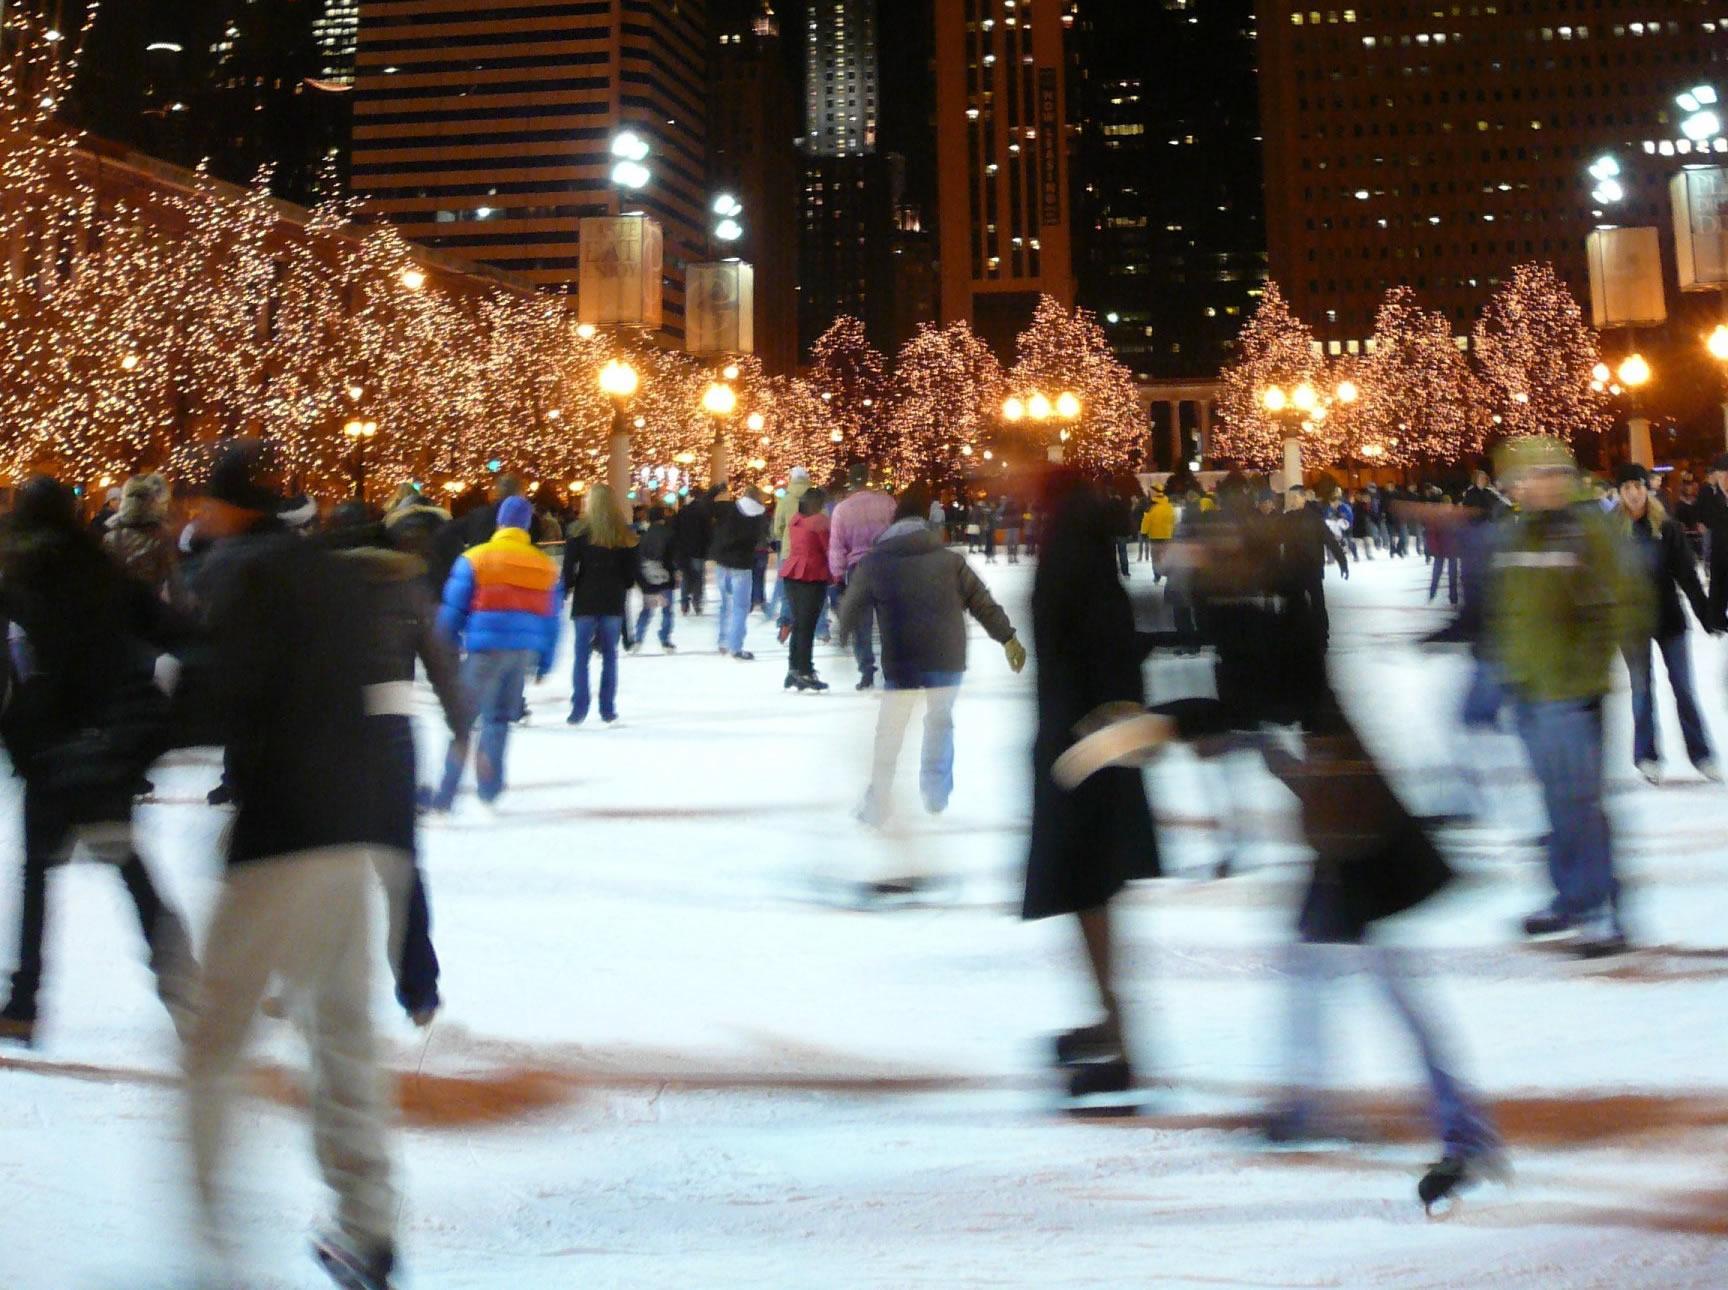 Christmas On Ice.Christmas On Ice Navidad Sobre Hielo Costa Del Sol News